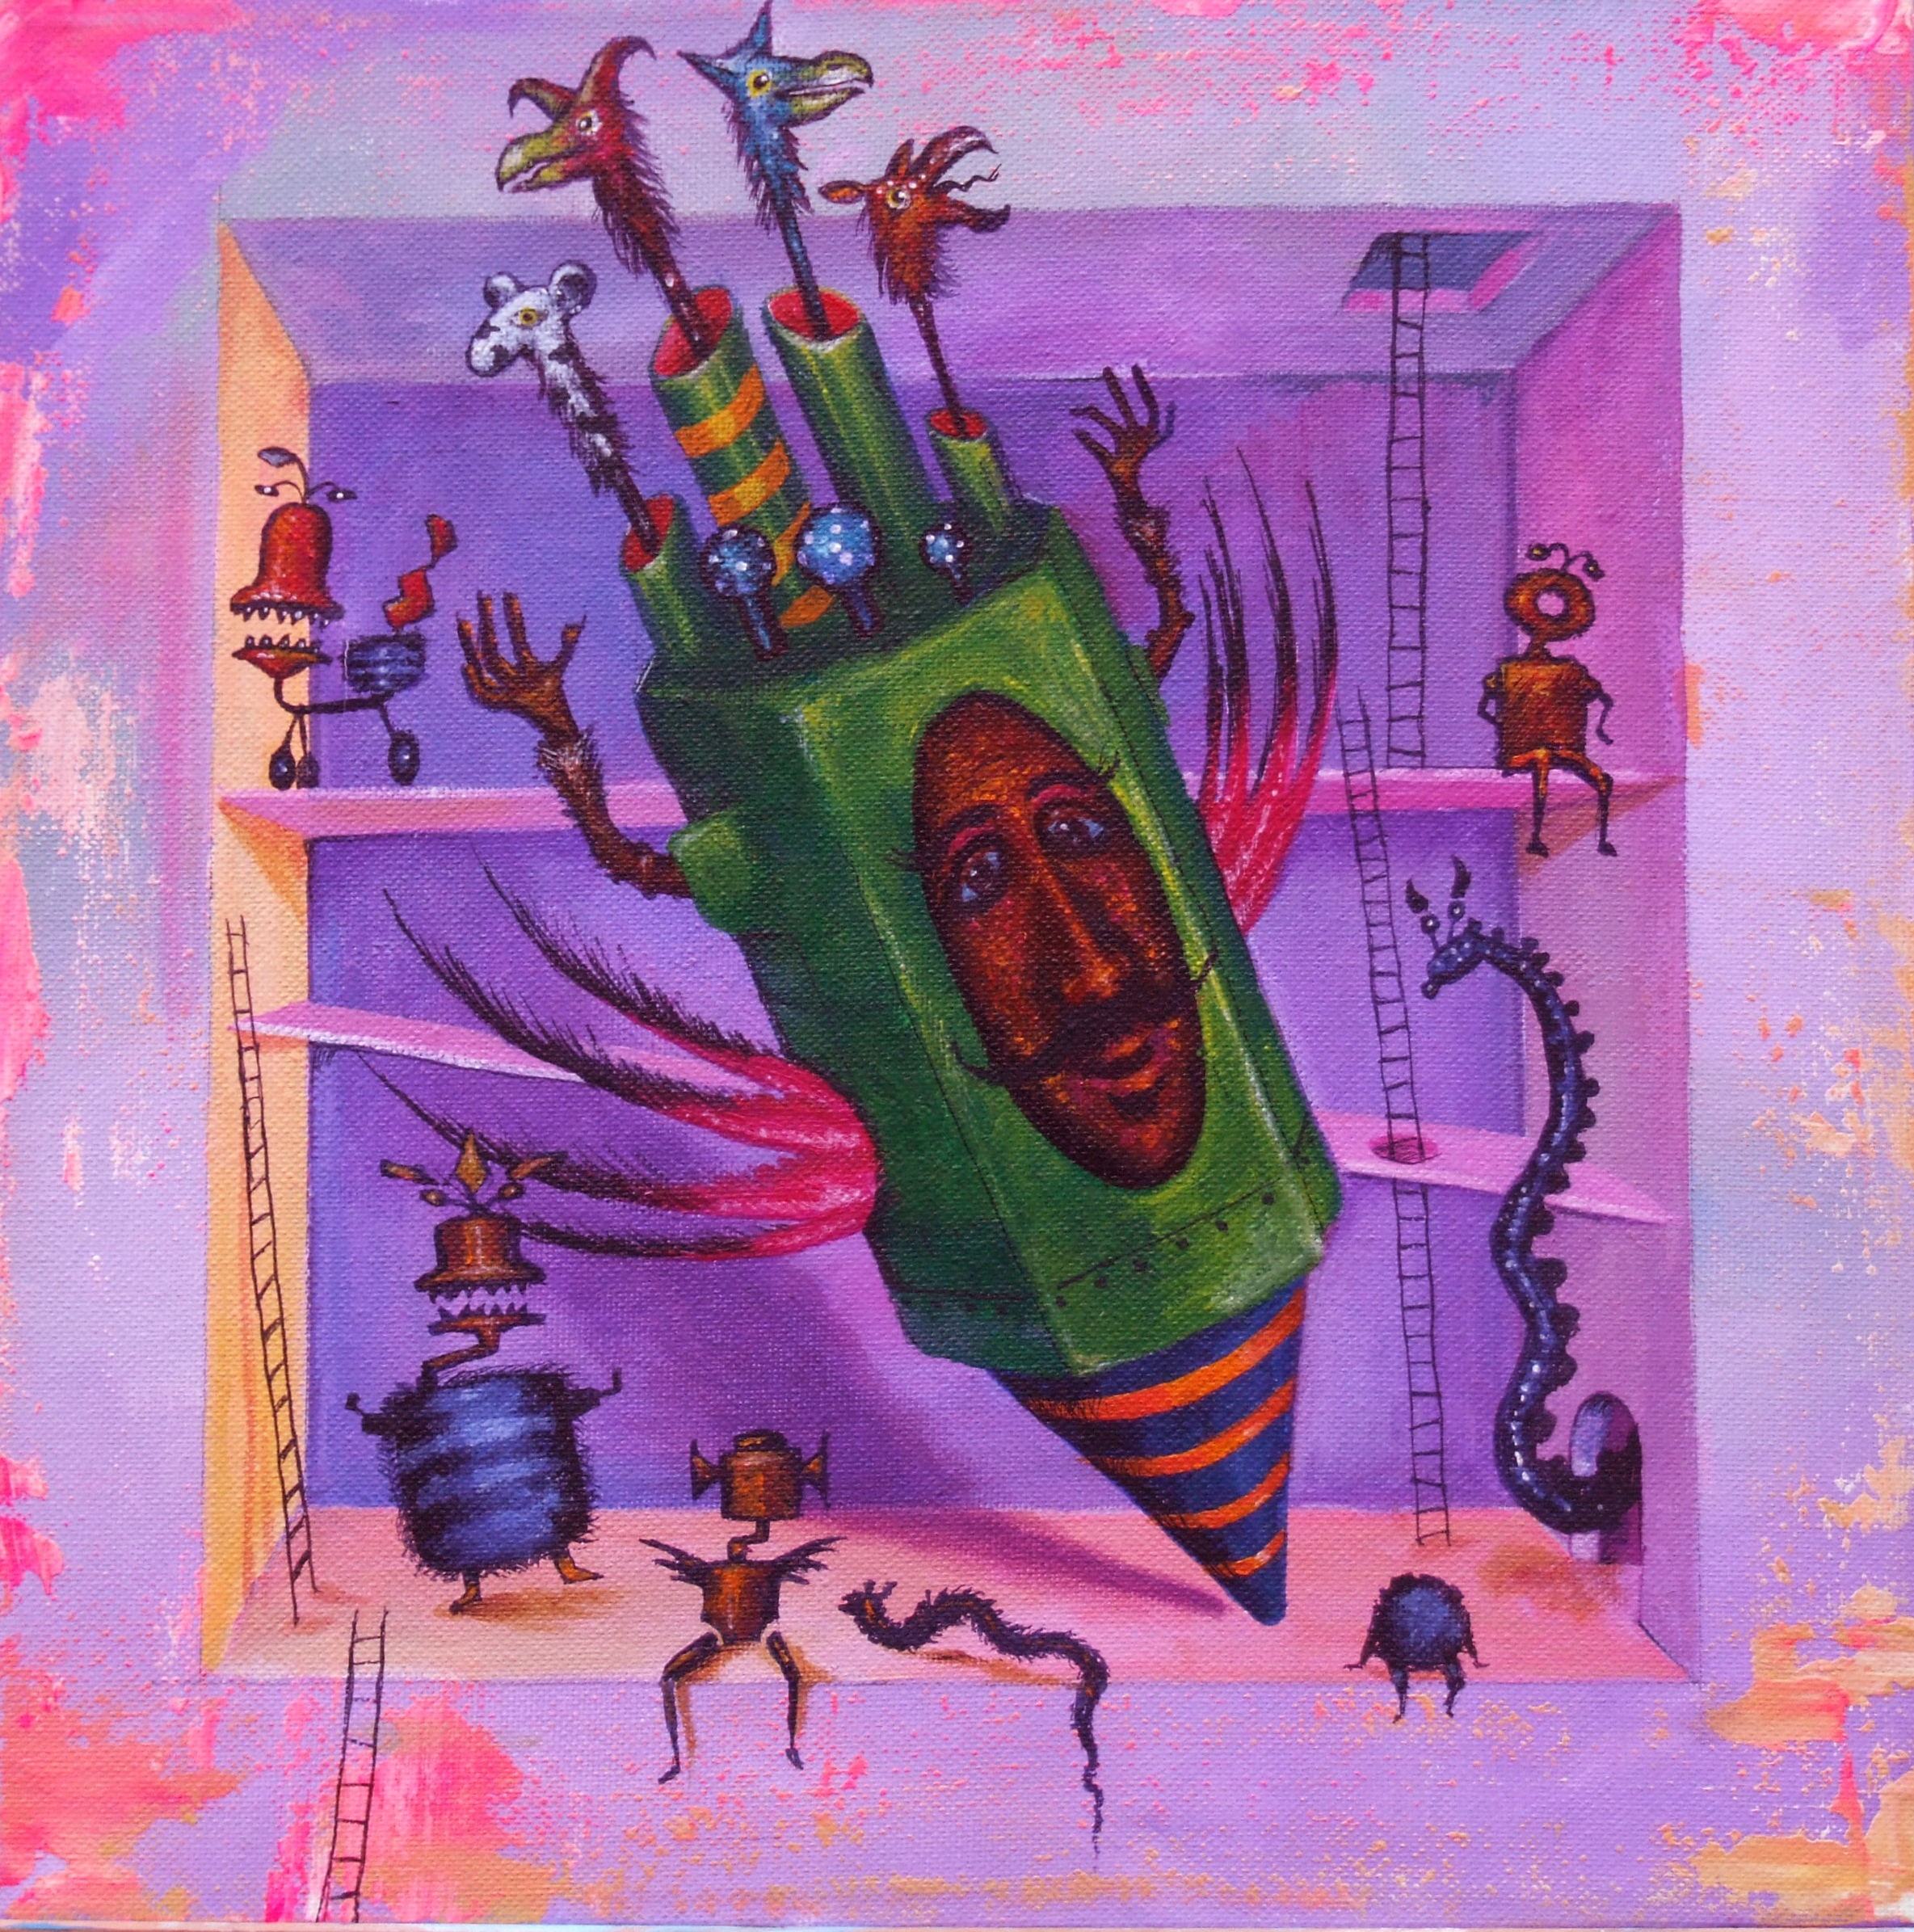 painting strange creatures